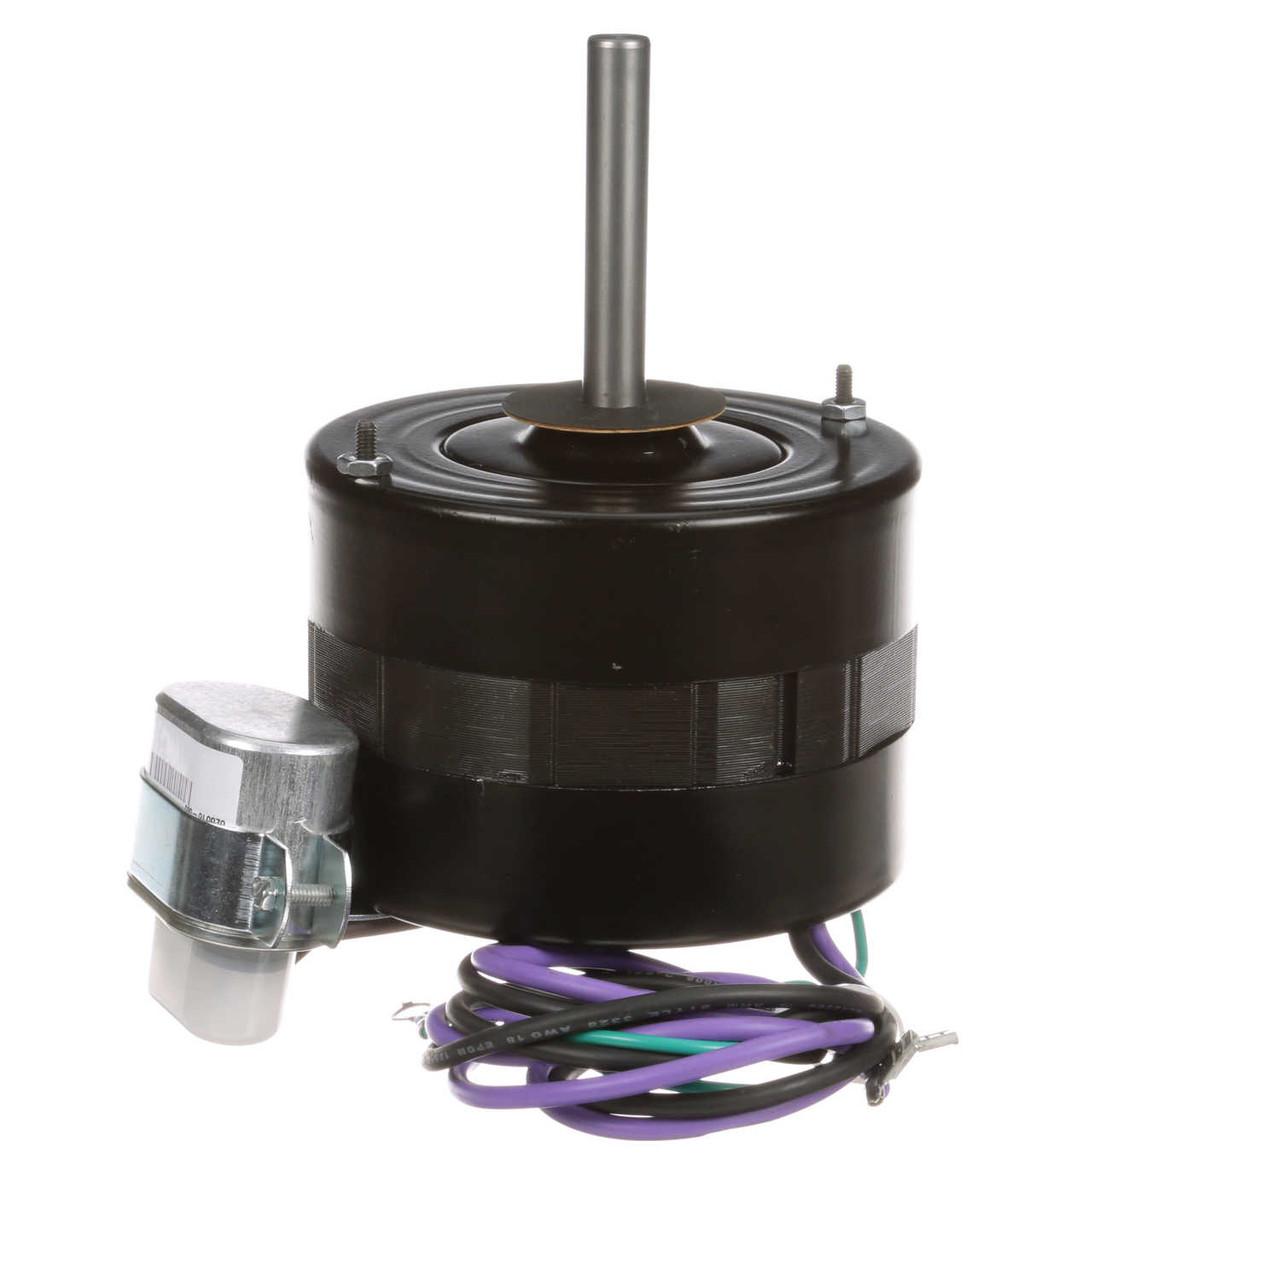 Trane Electric Motor 1/8 hp 1550 RPM 208-240V Century # OTR4513 ...